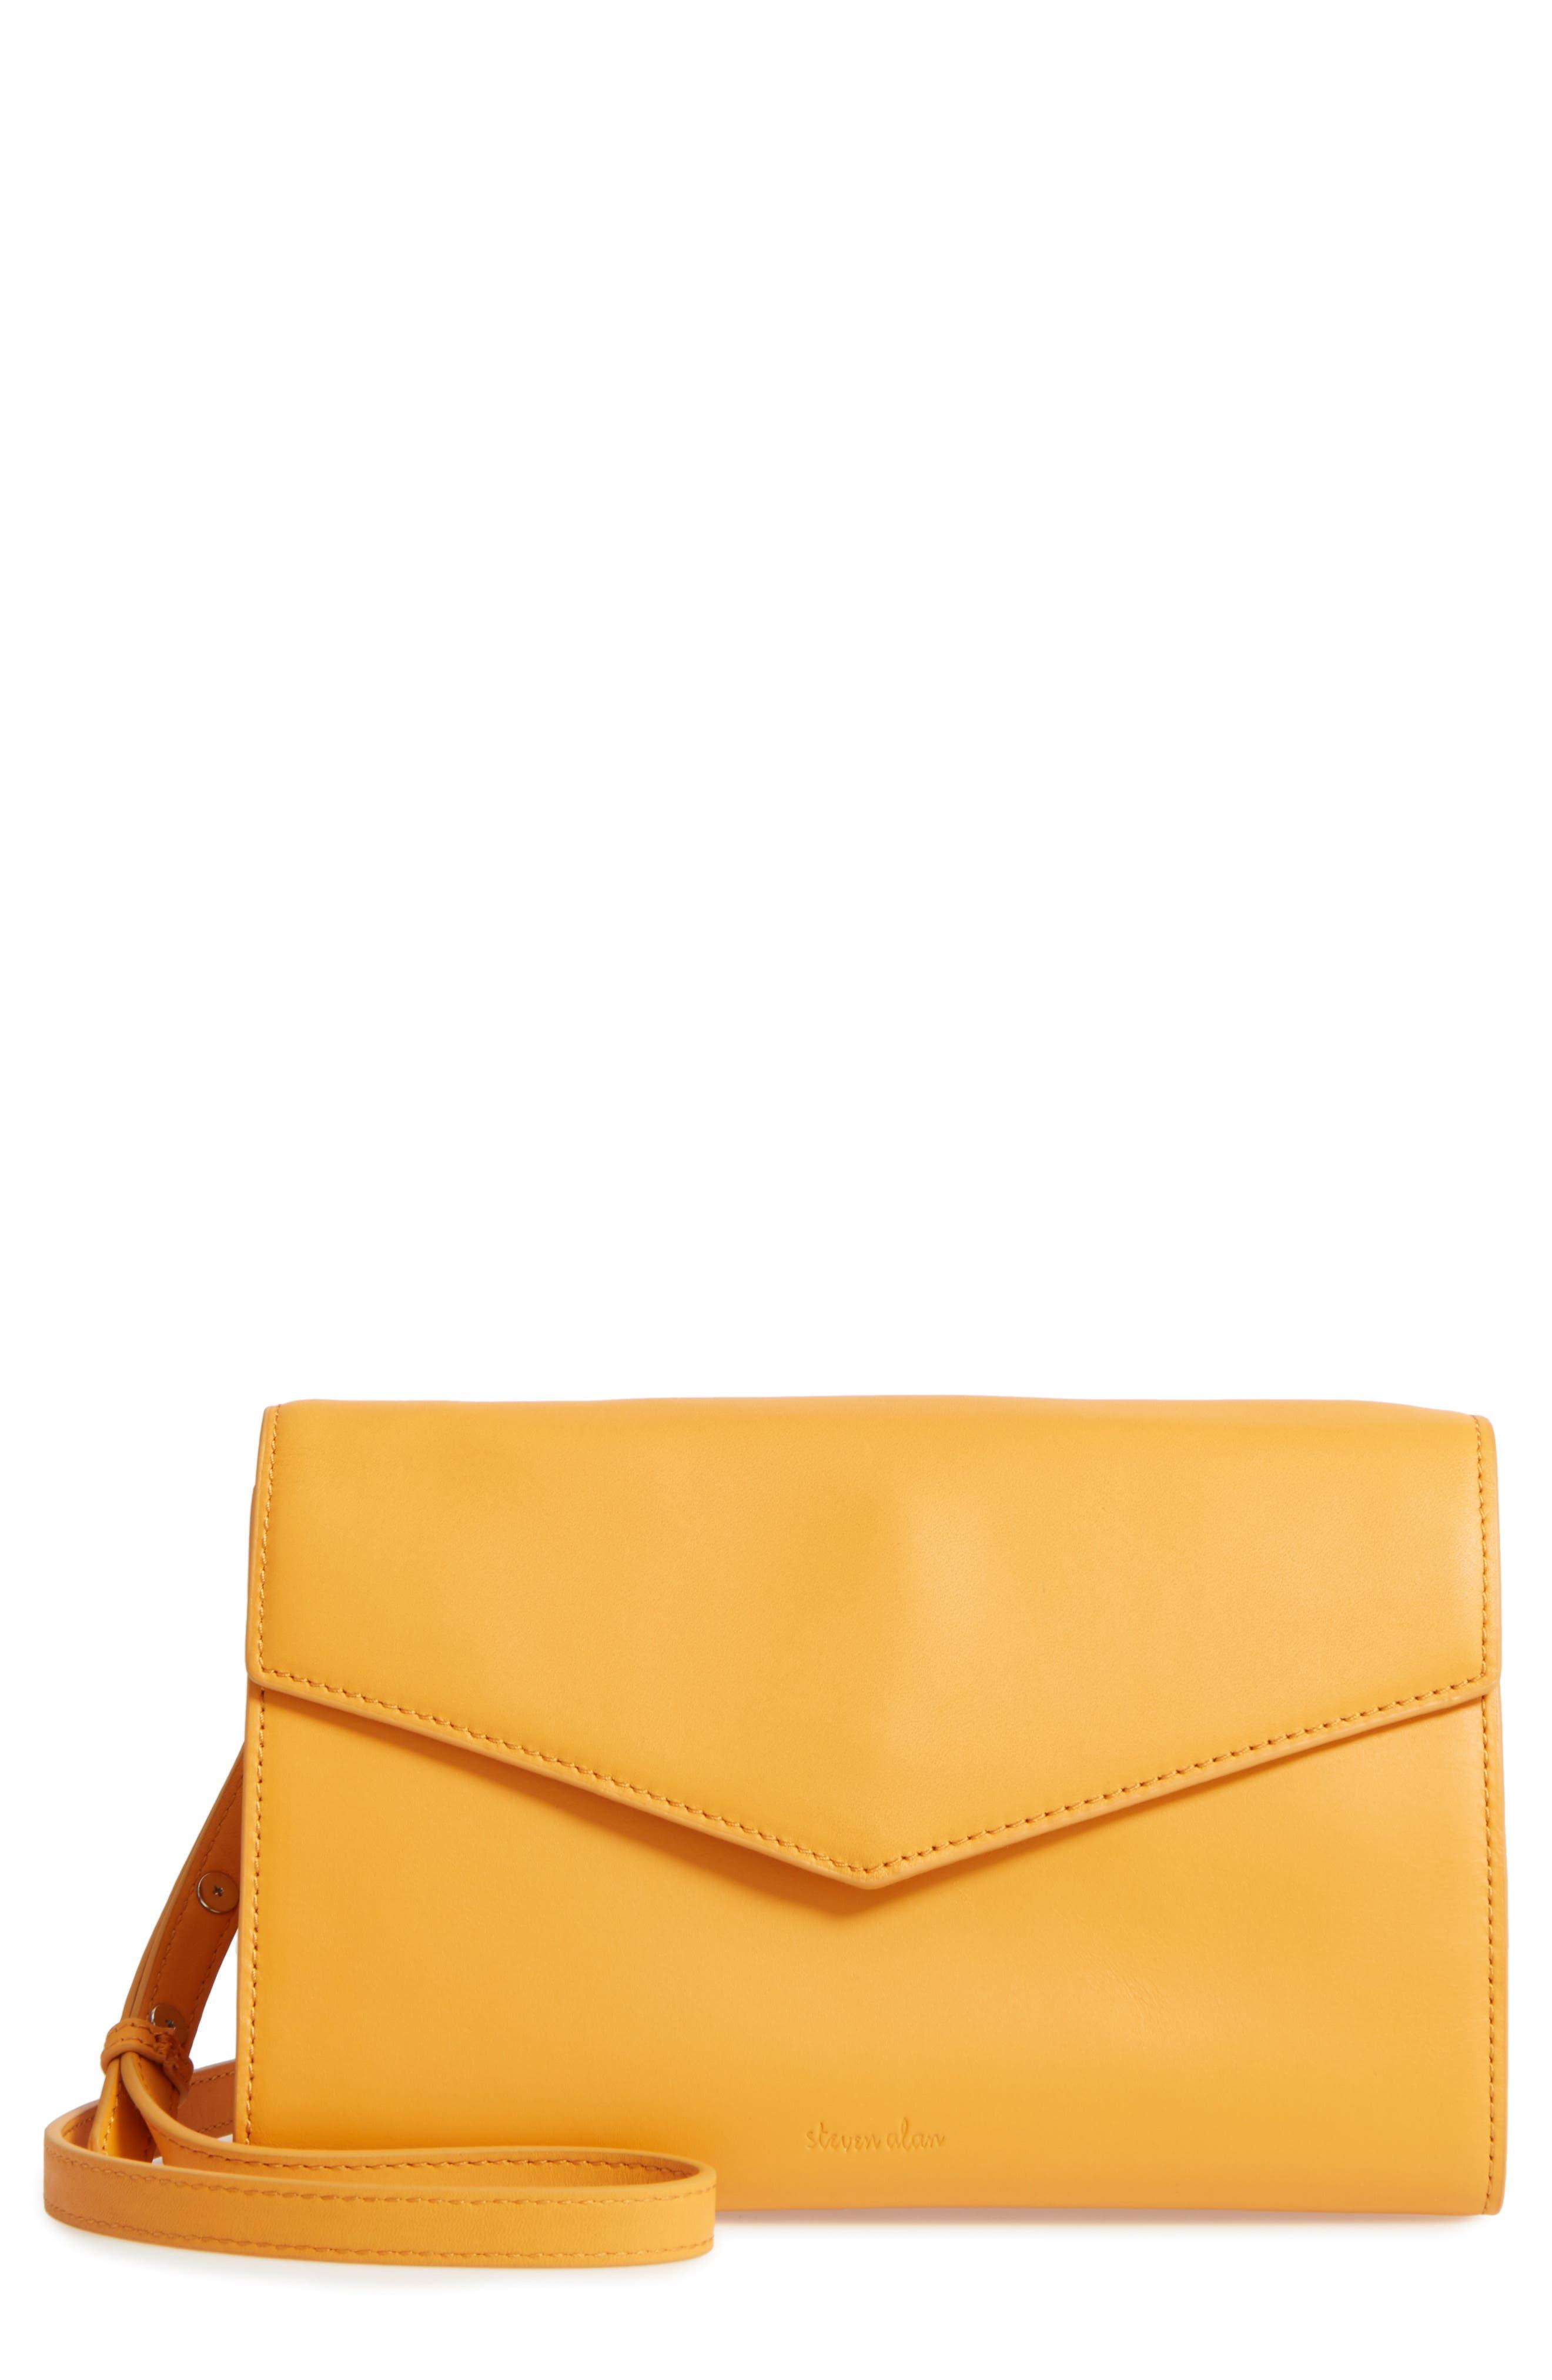 Easton Leather Envelope Crossbody Bag,                         Main,                         color, Ochre